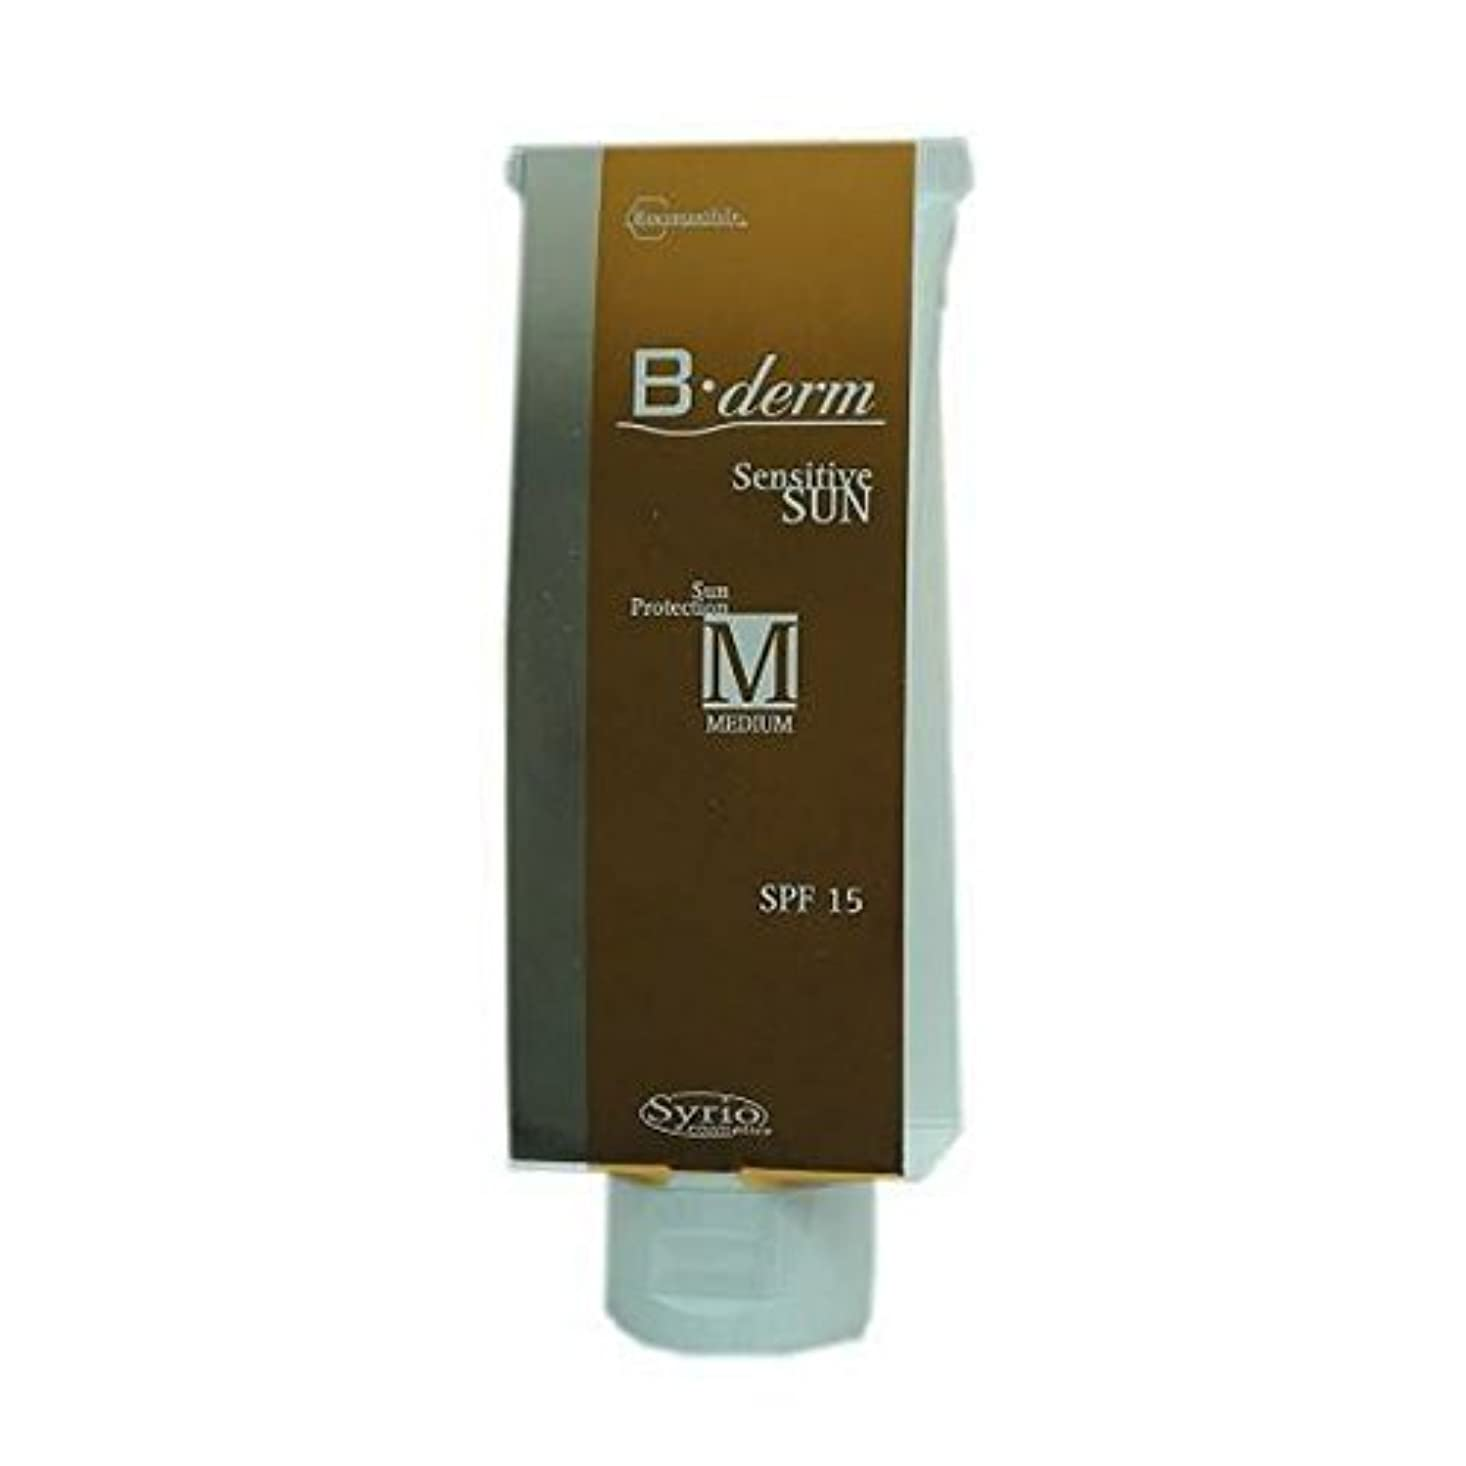 B-derm Sun Cream Spf15 125ml [並行輸入品]